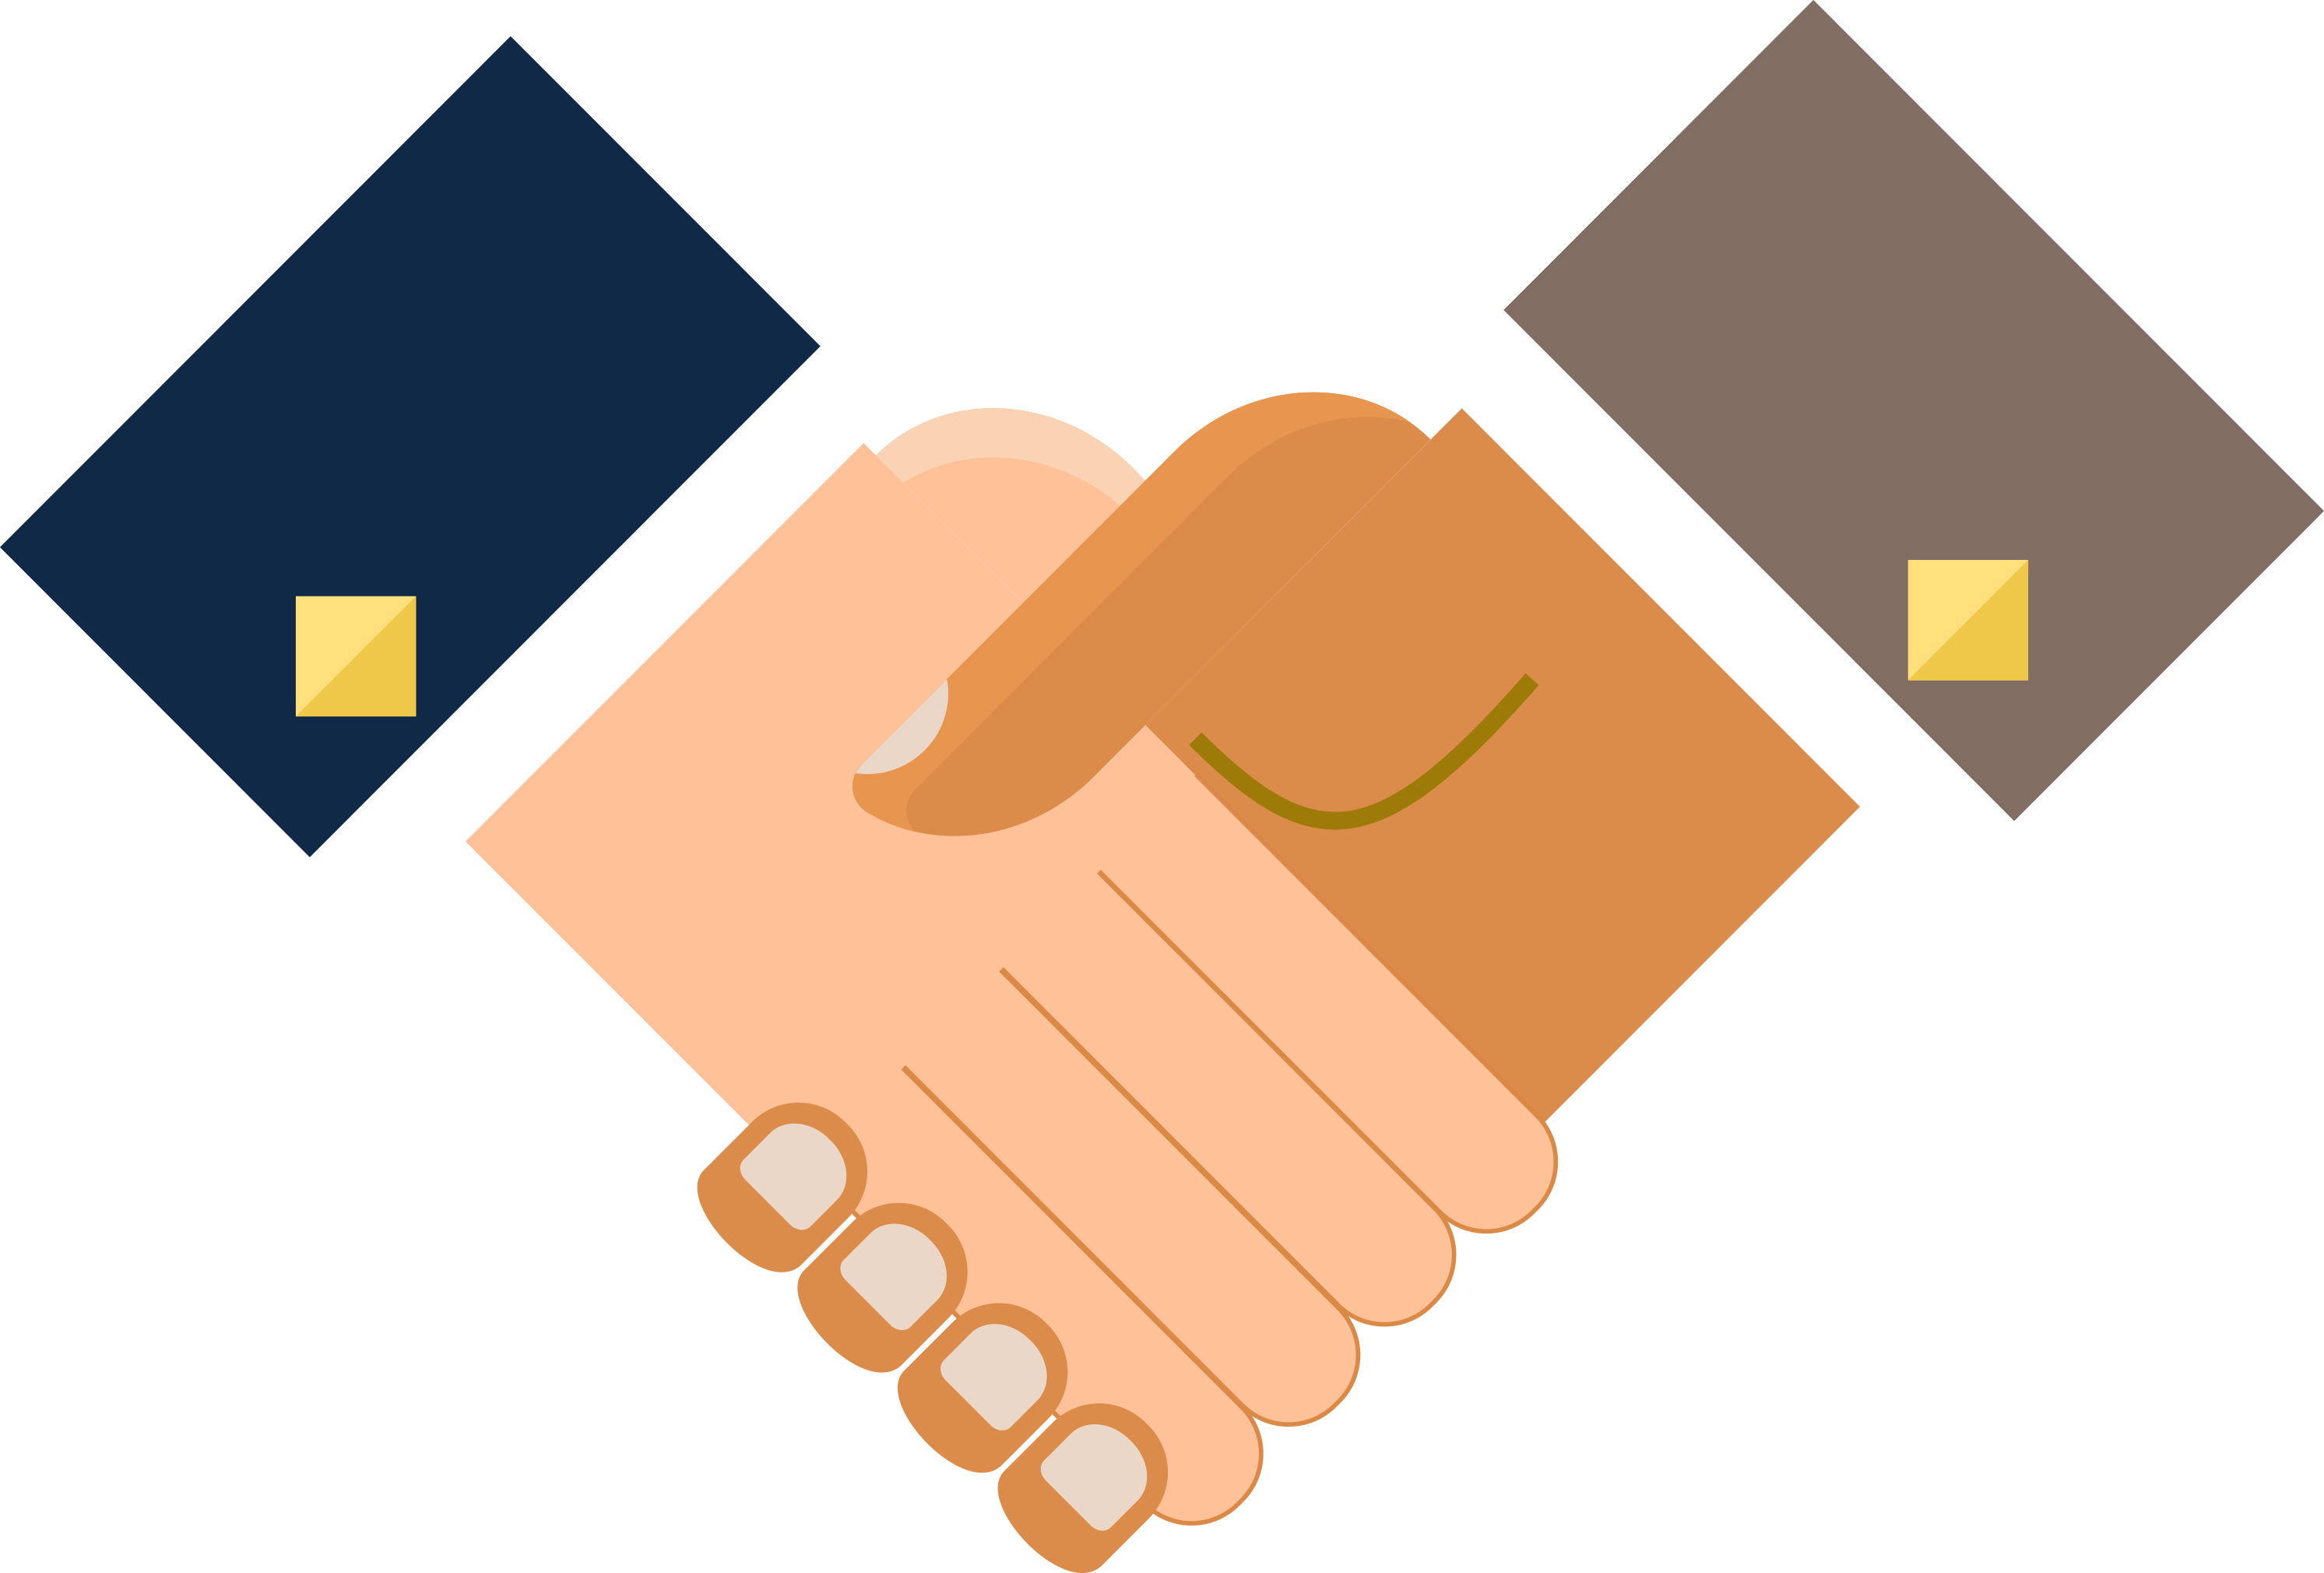 fidelizacao-de-clientes-como-diferencial-competitivo-02